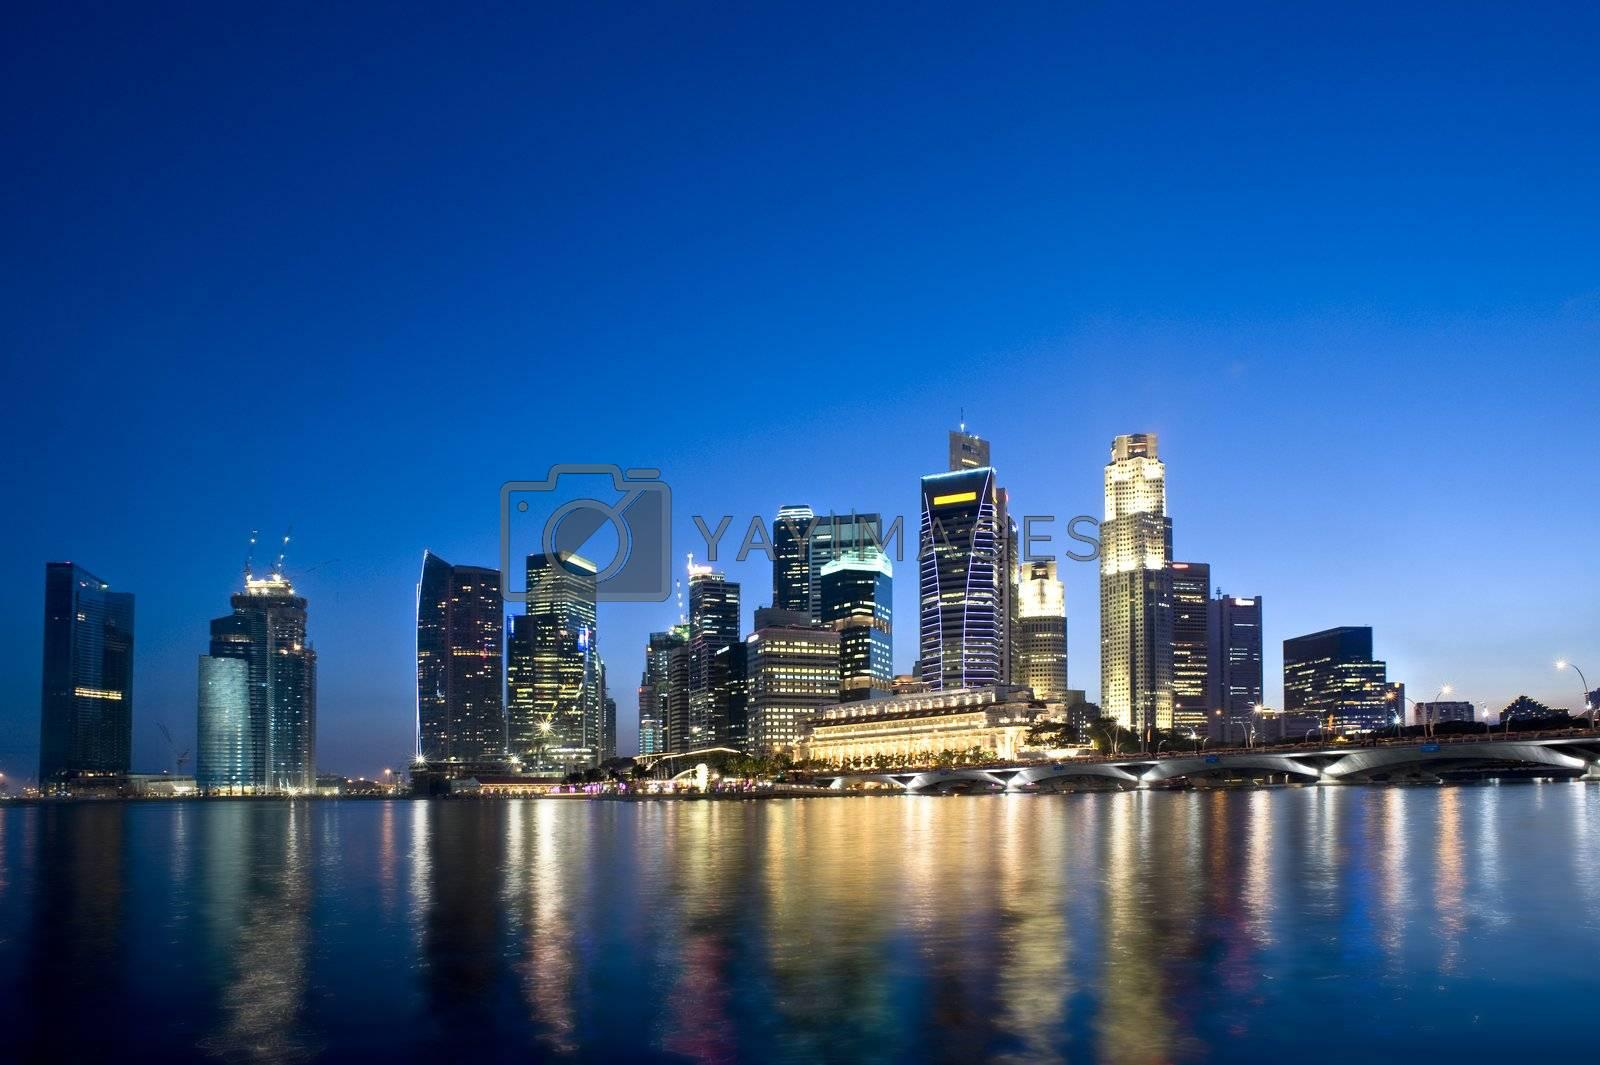 Singapore City skyline as it was in Feb 2010.